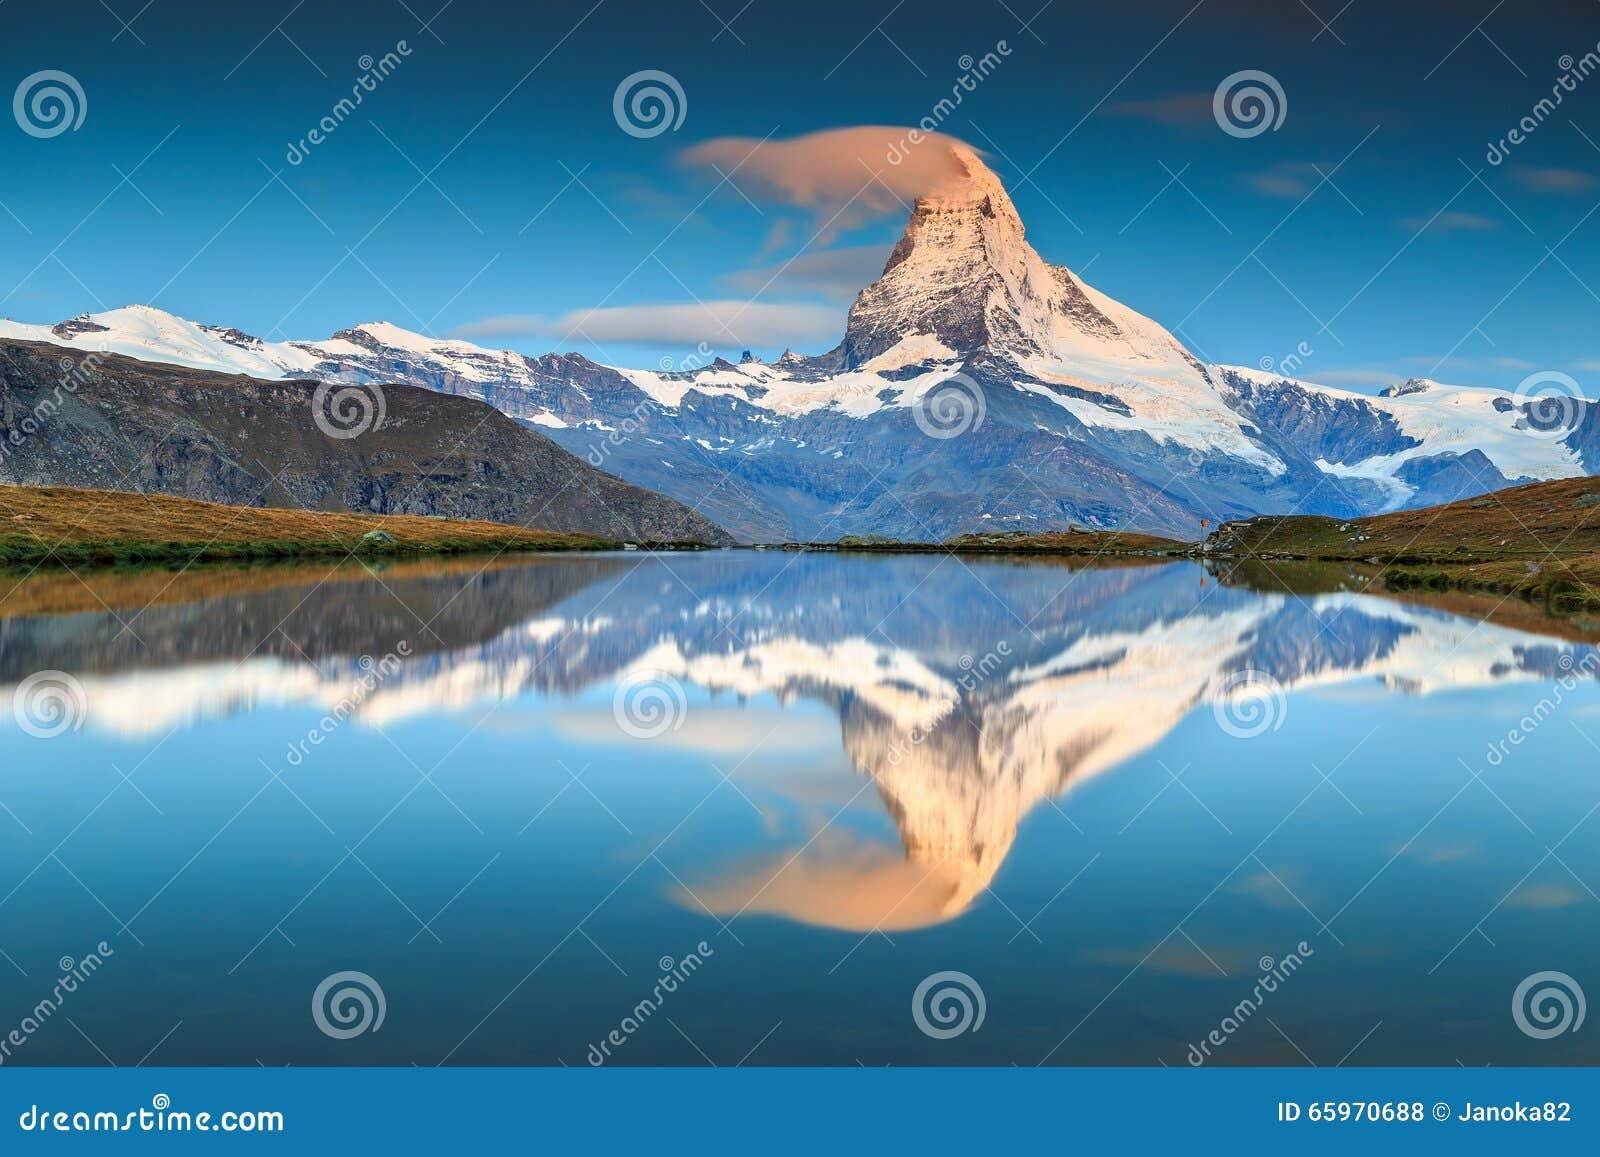 Magical sunrise with Matterhorn peak and Stellisee lake,Valais,Switzerland